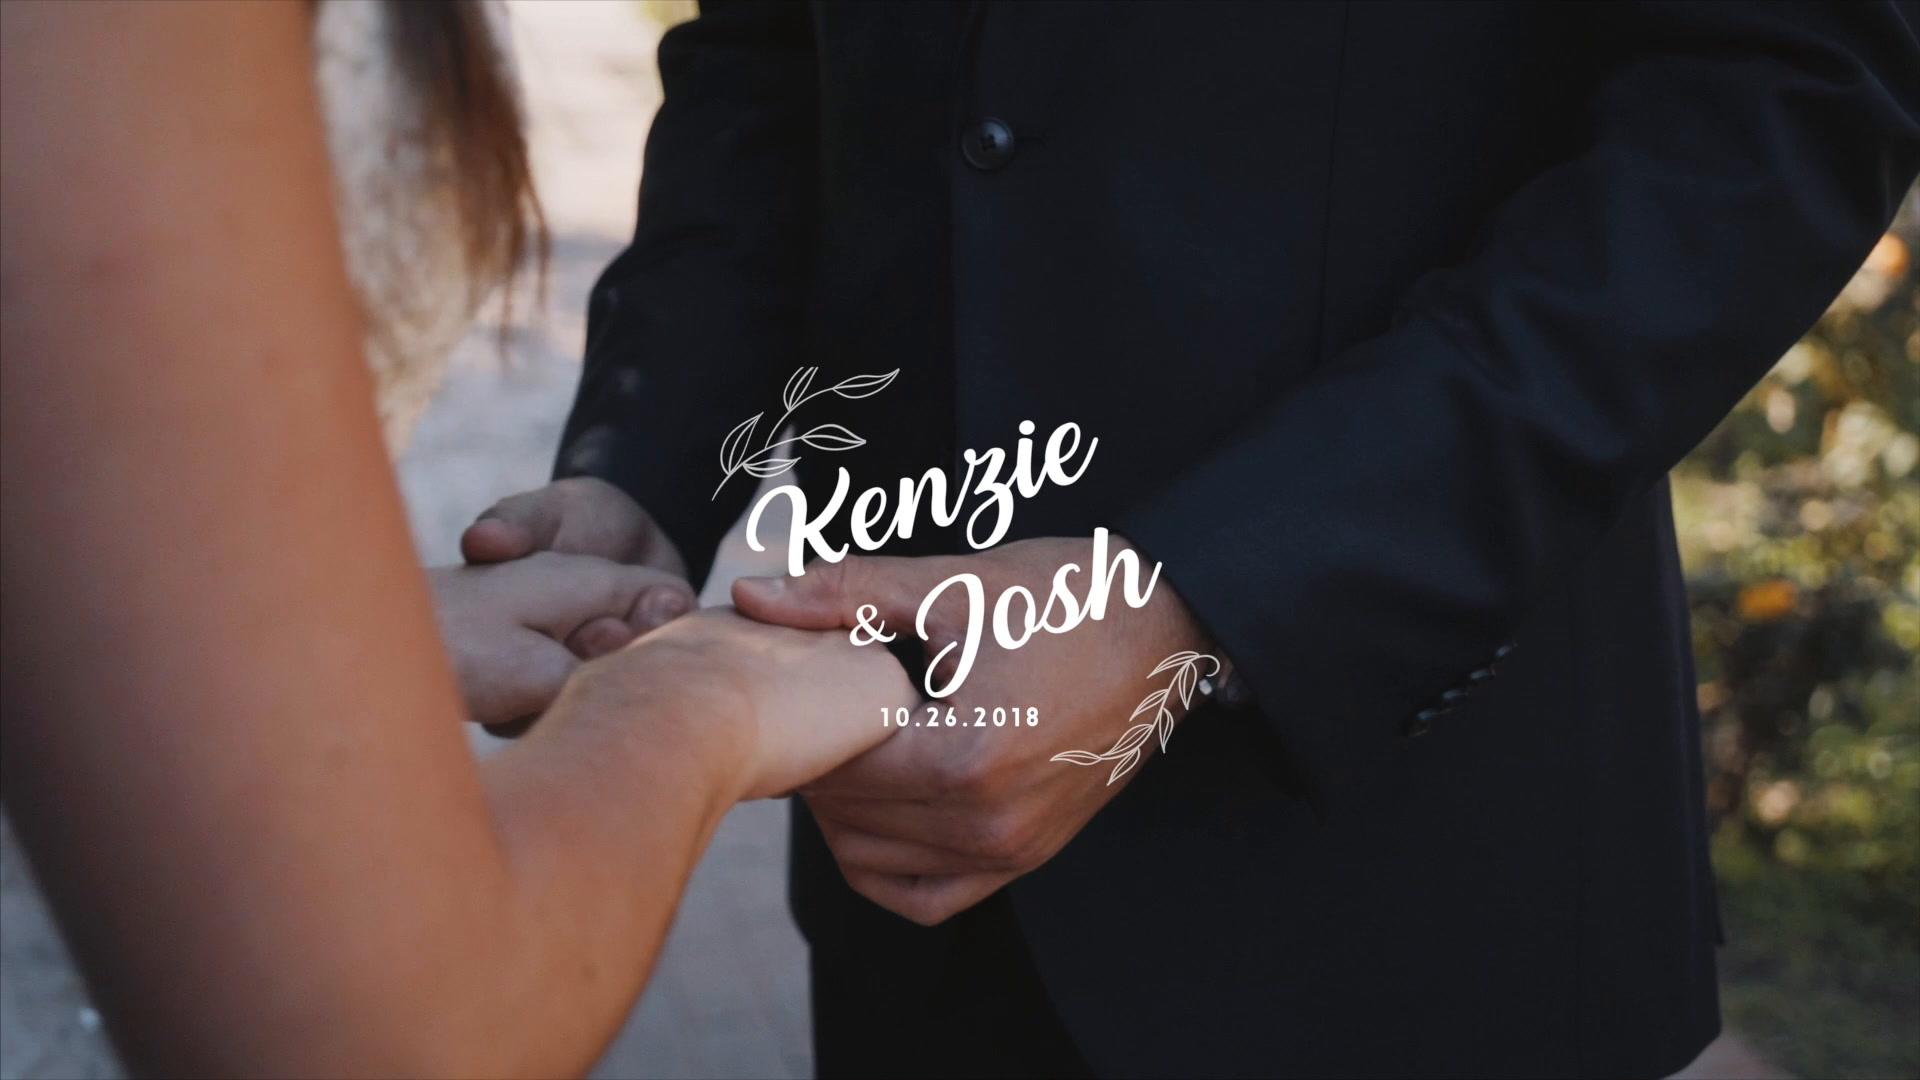 Kenzie + Josh | Phoenix, Arizona | Heritage Square